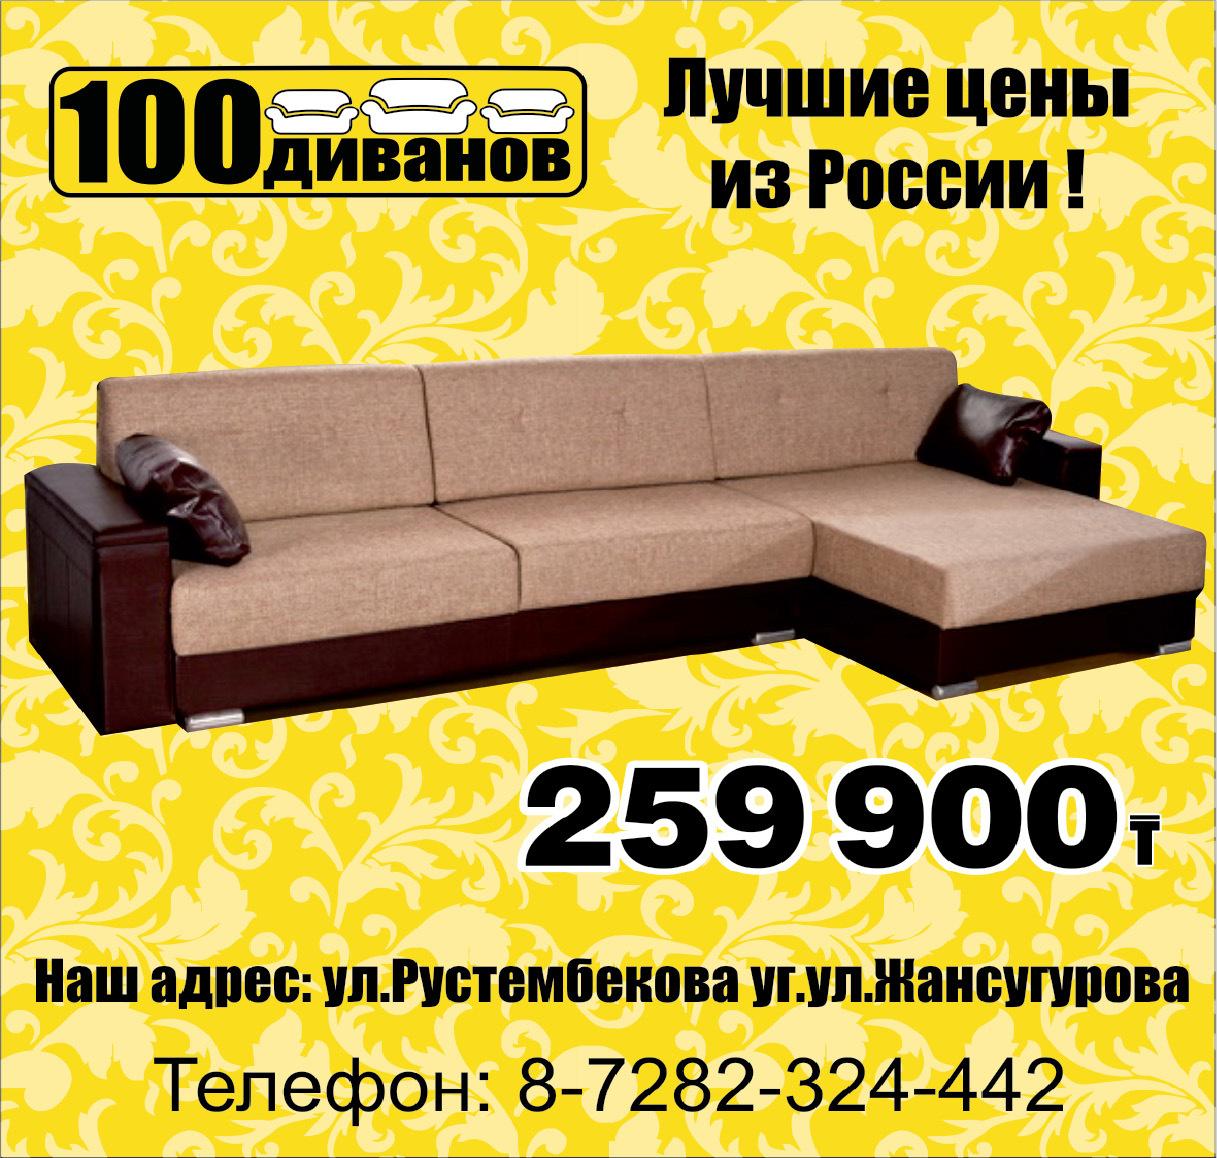 100 диванов